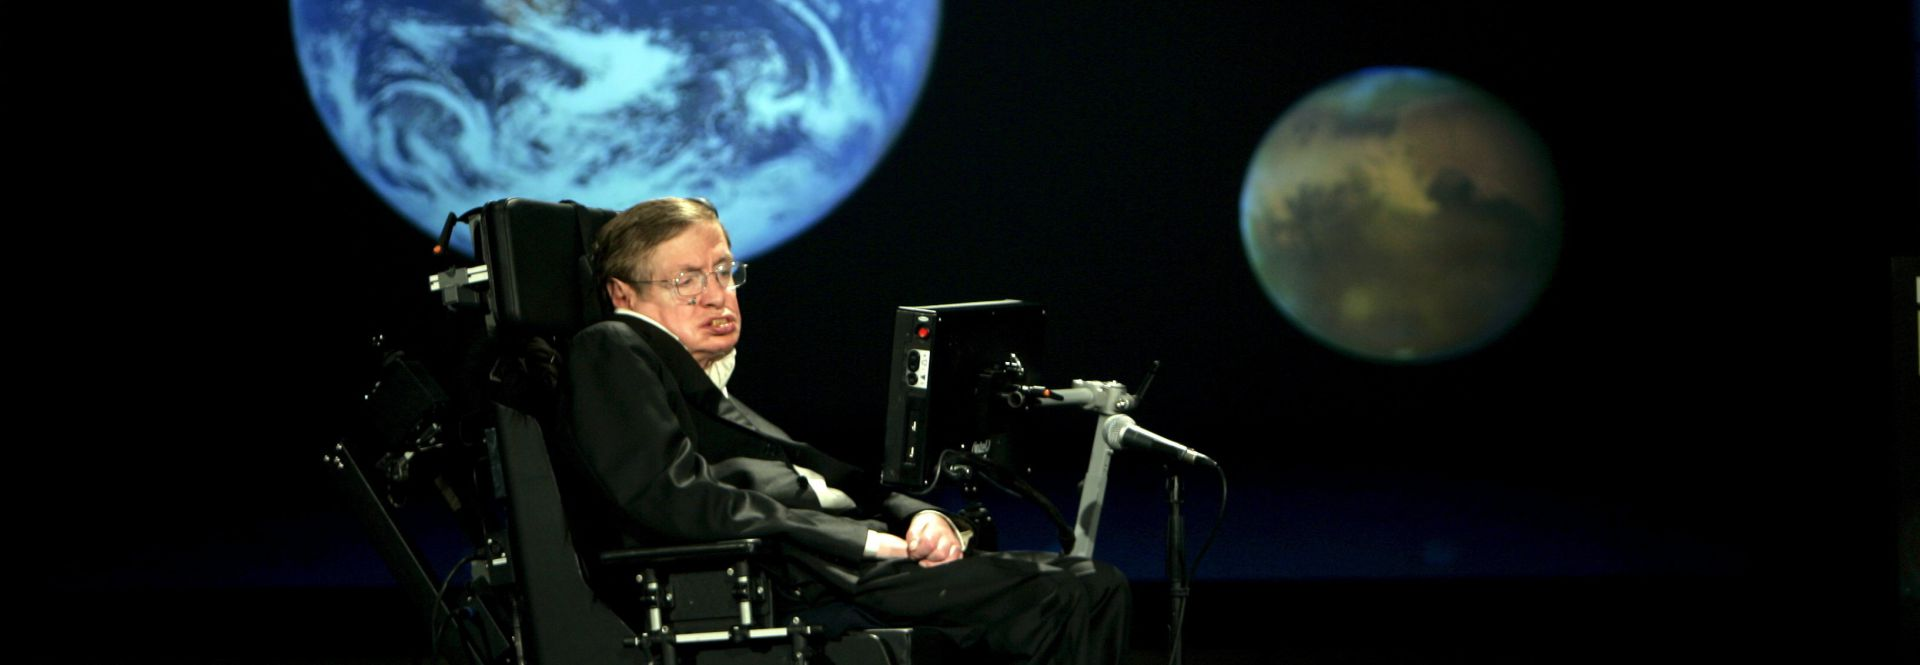 Farewell to Hawking EFE